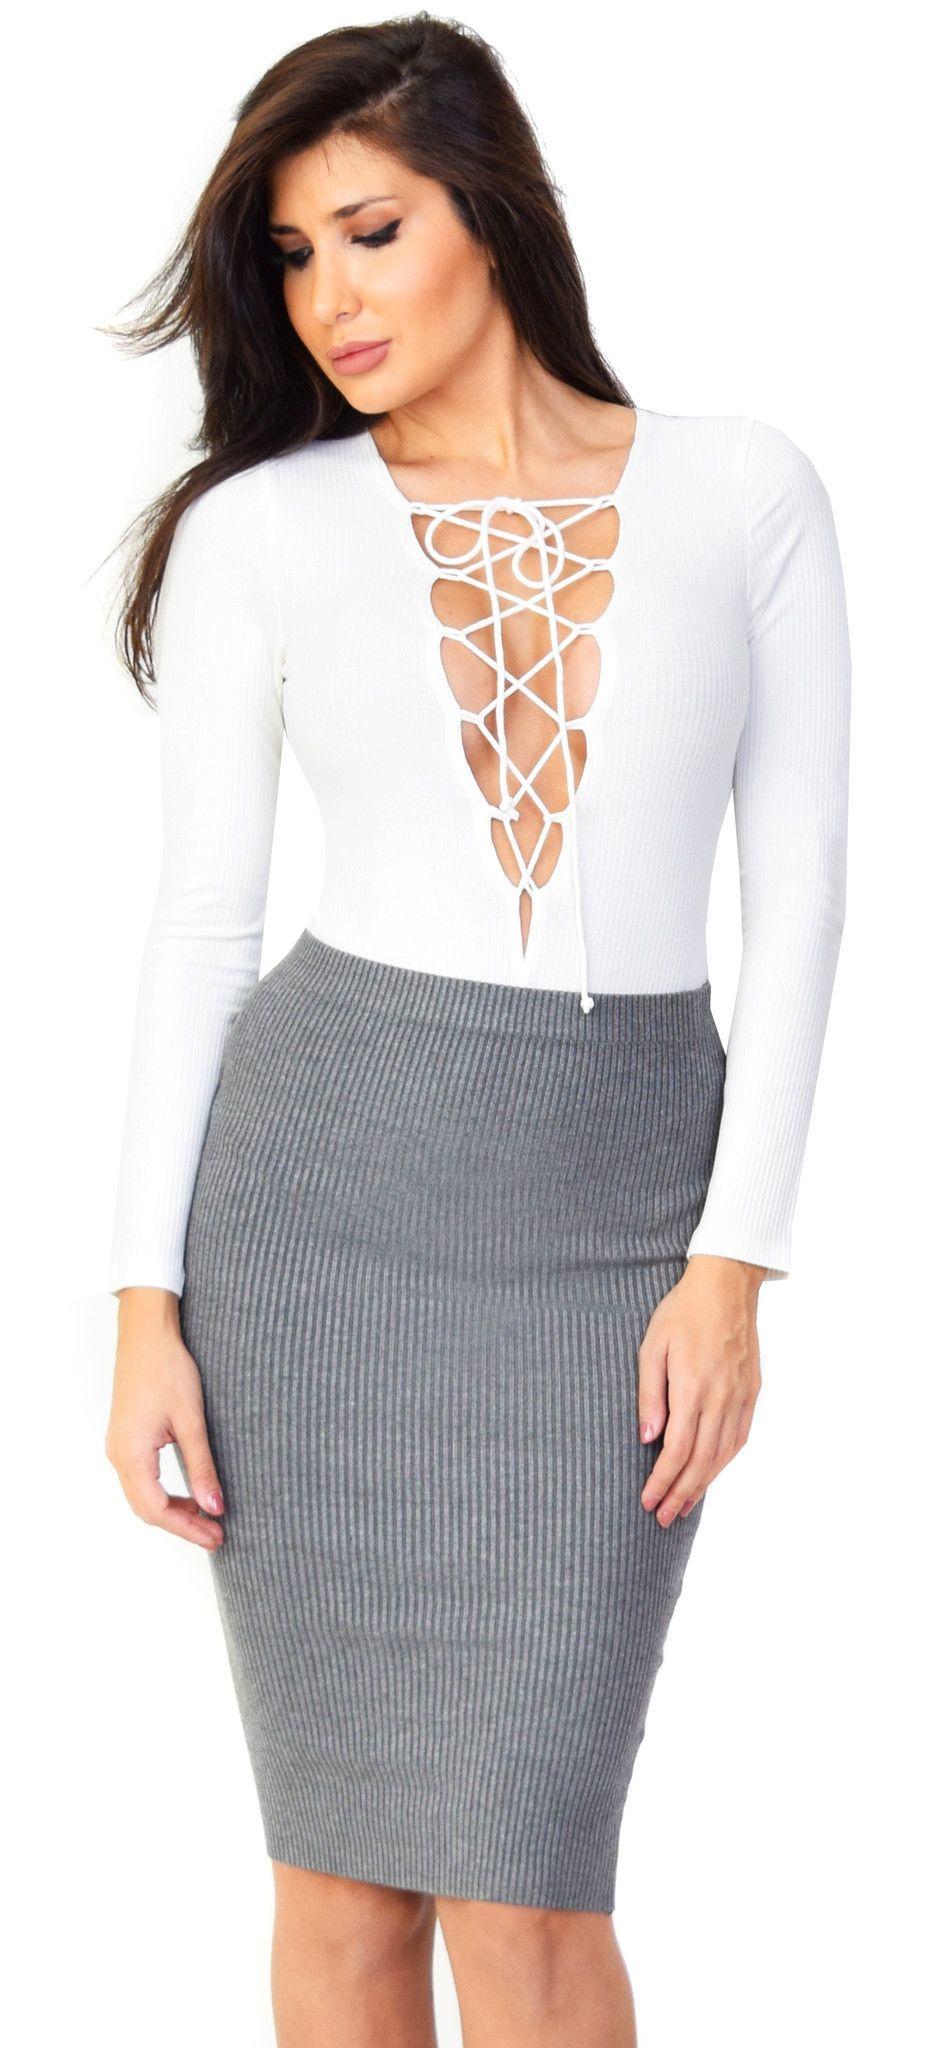 Off white lace up bodysuit fall fashion pinterest white lace